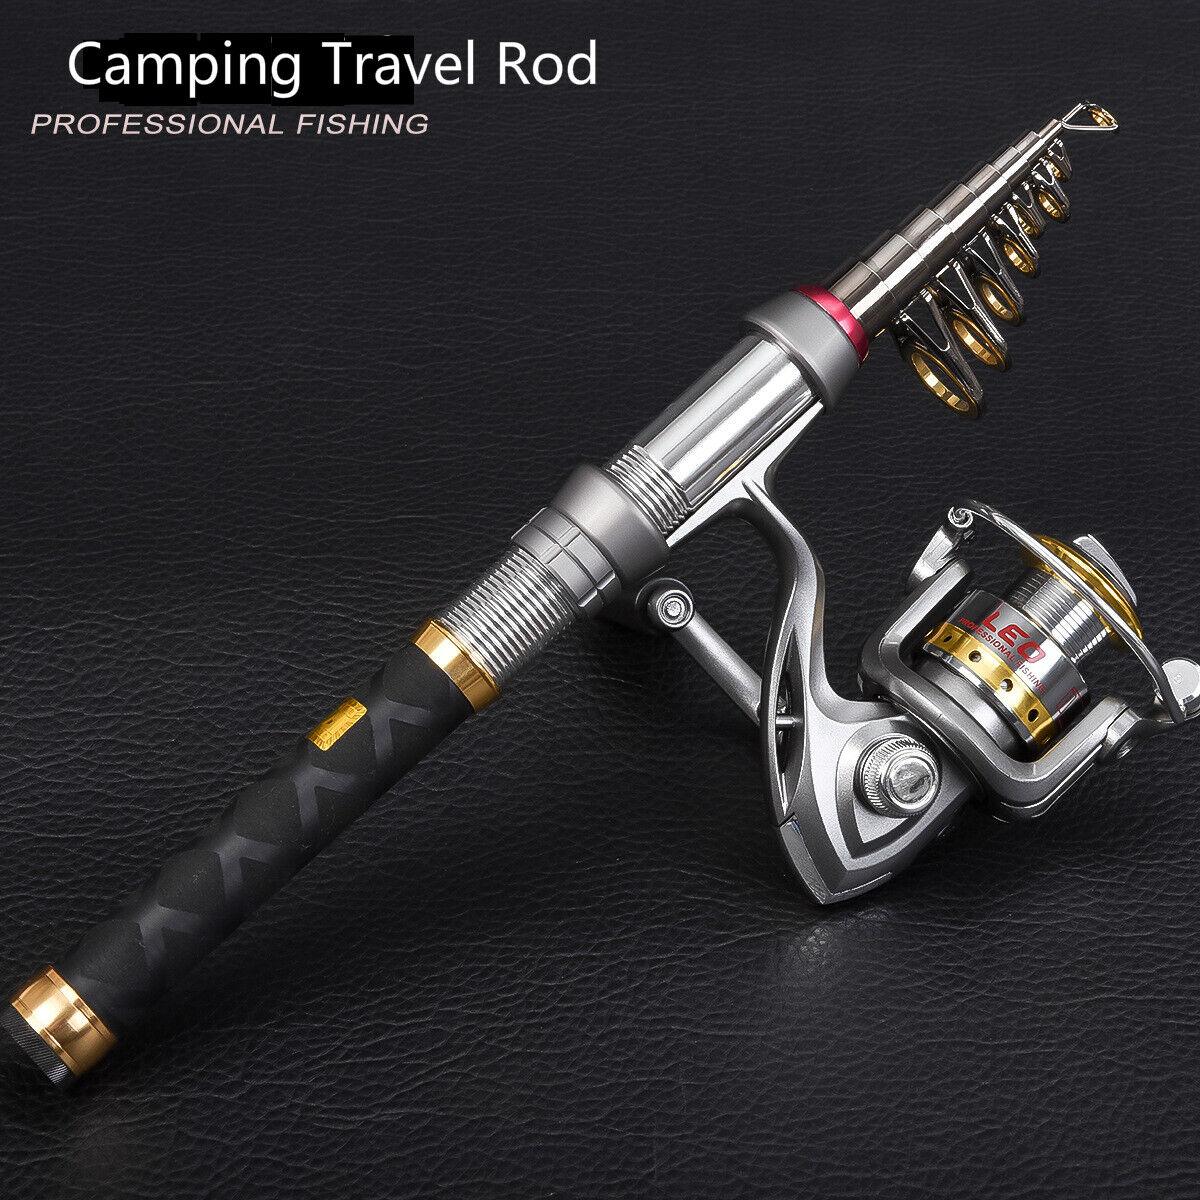 Carbon Travel Heavy Duty Telescopic Sea Pier Beach Carp Fishing rod CW:60-150g